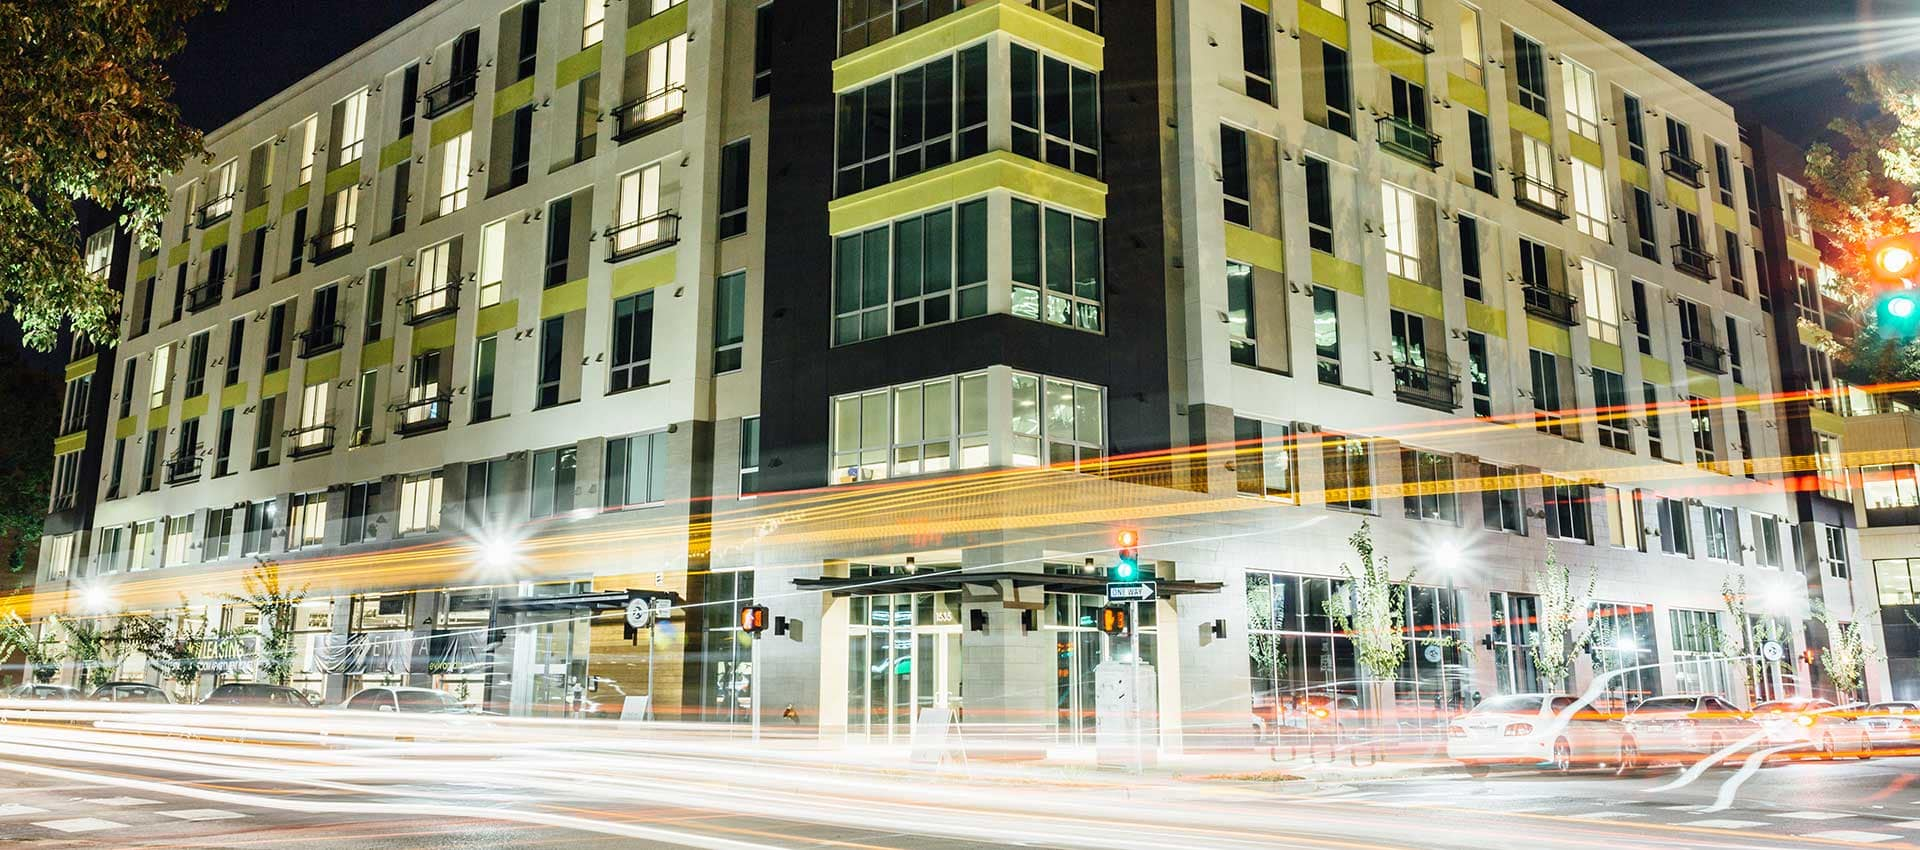 EVIVA Midtown at night in Sacramento, California